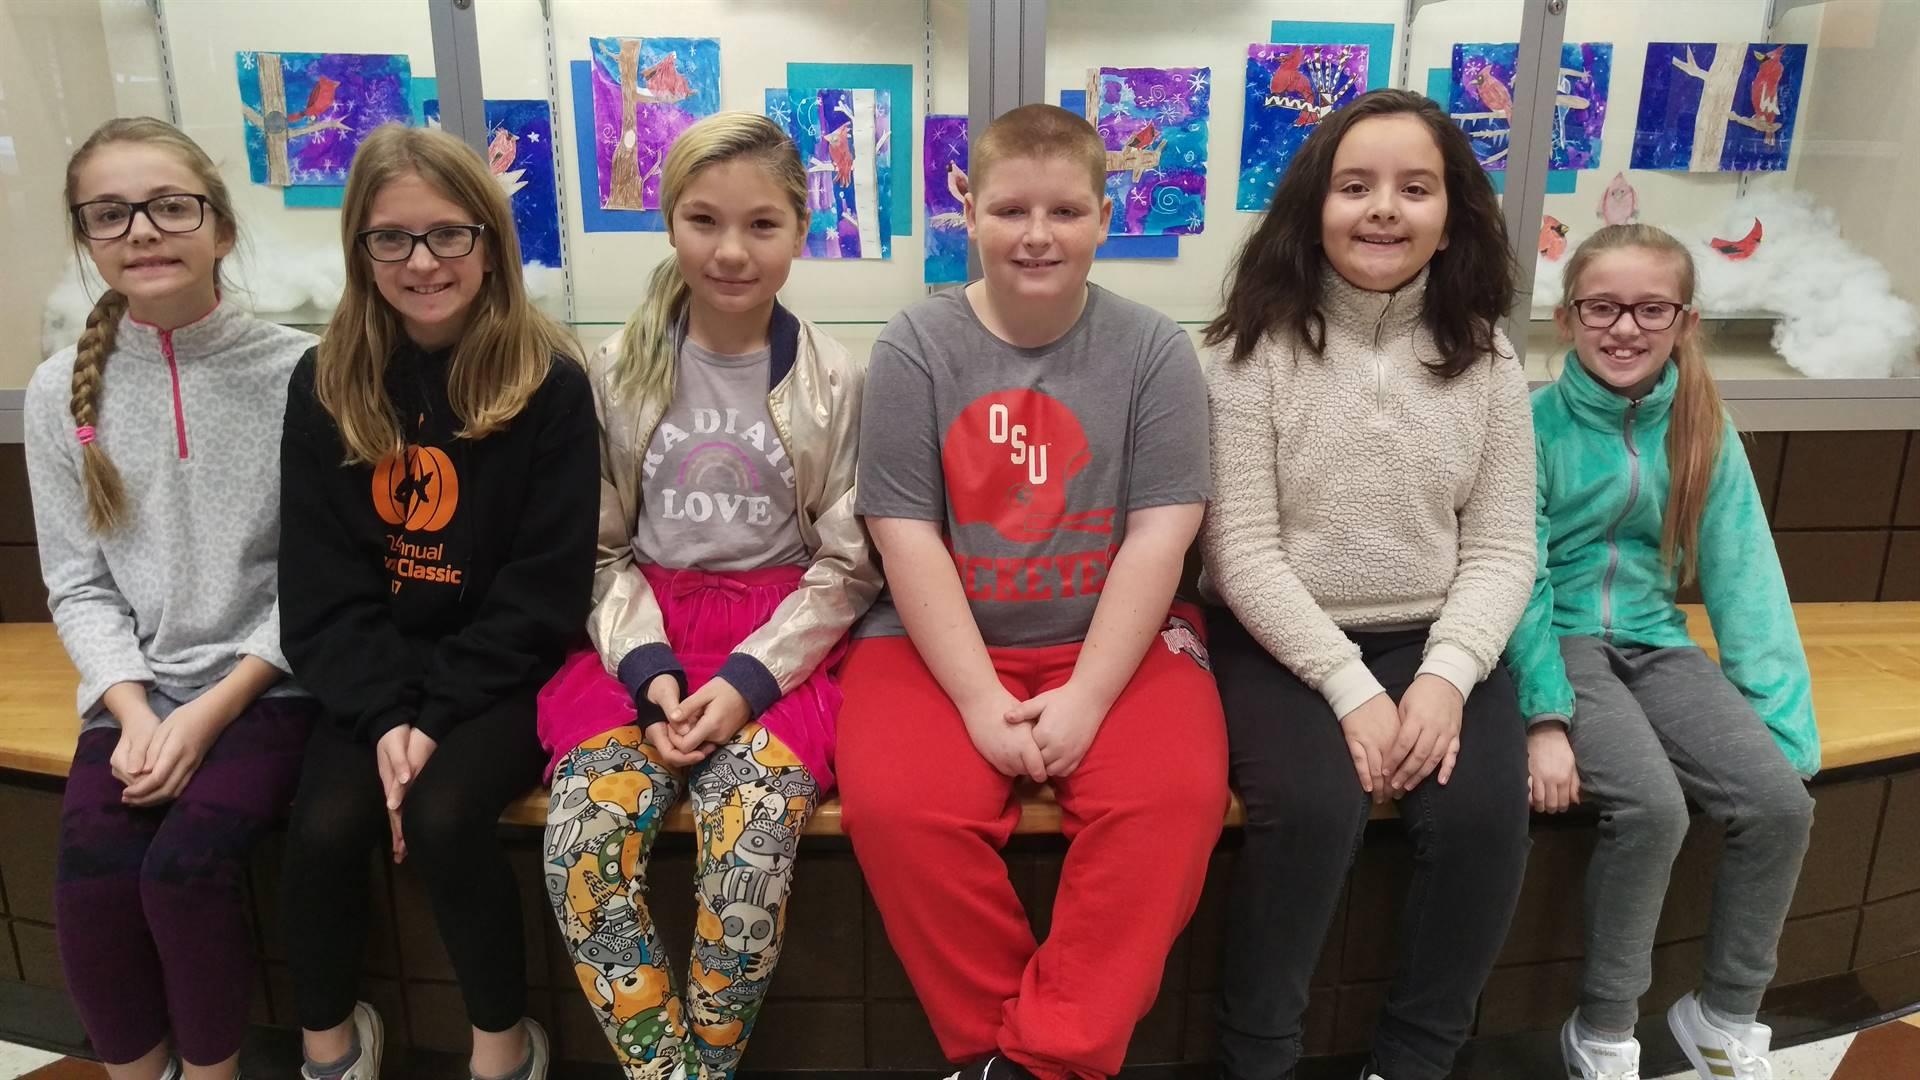 5th grade Principal's Honor Roll Students